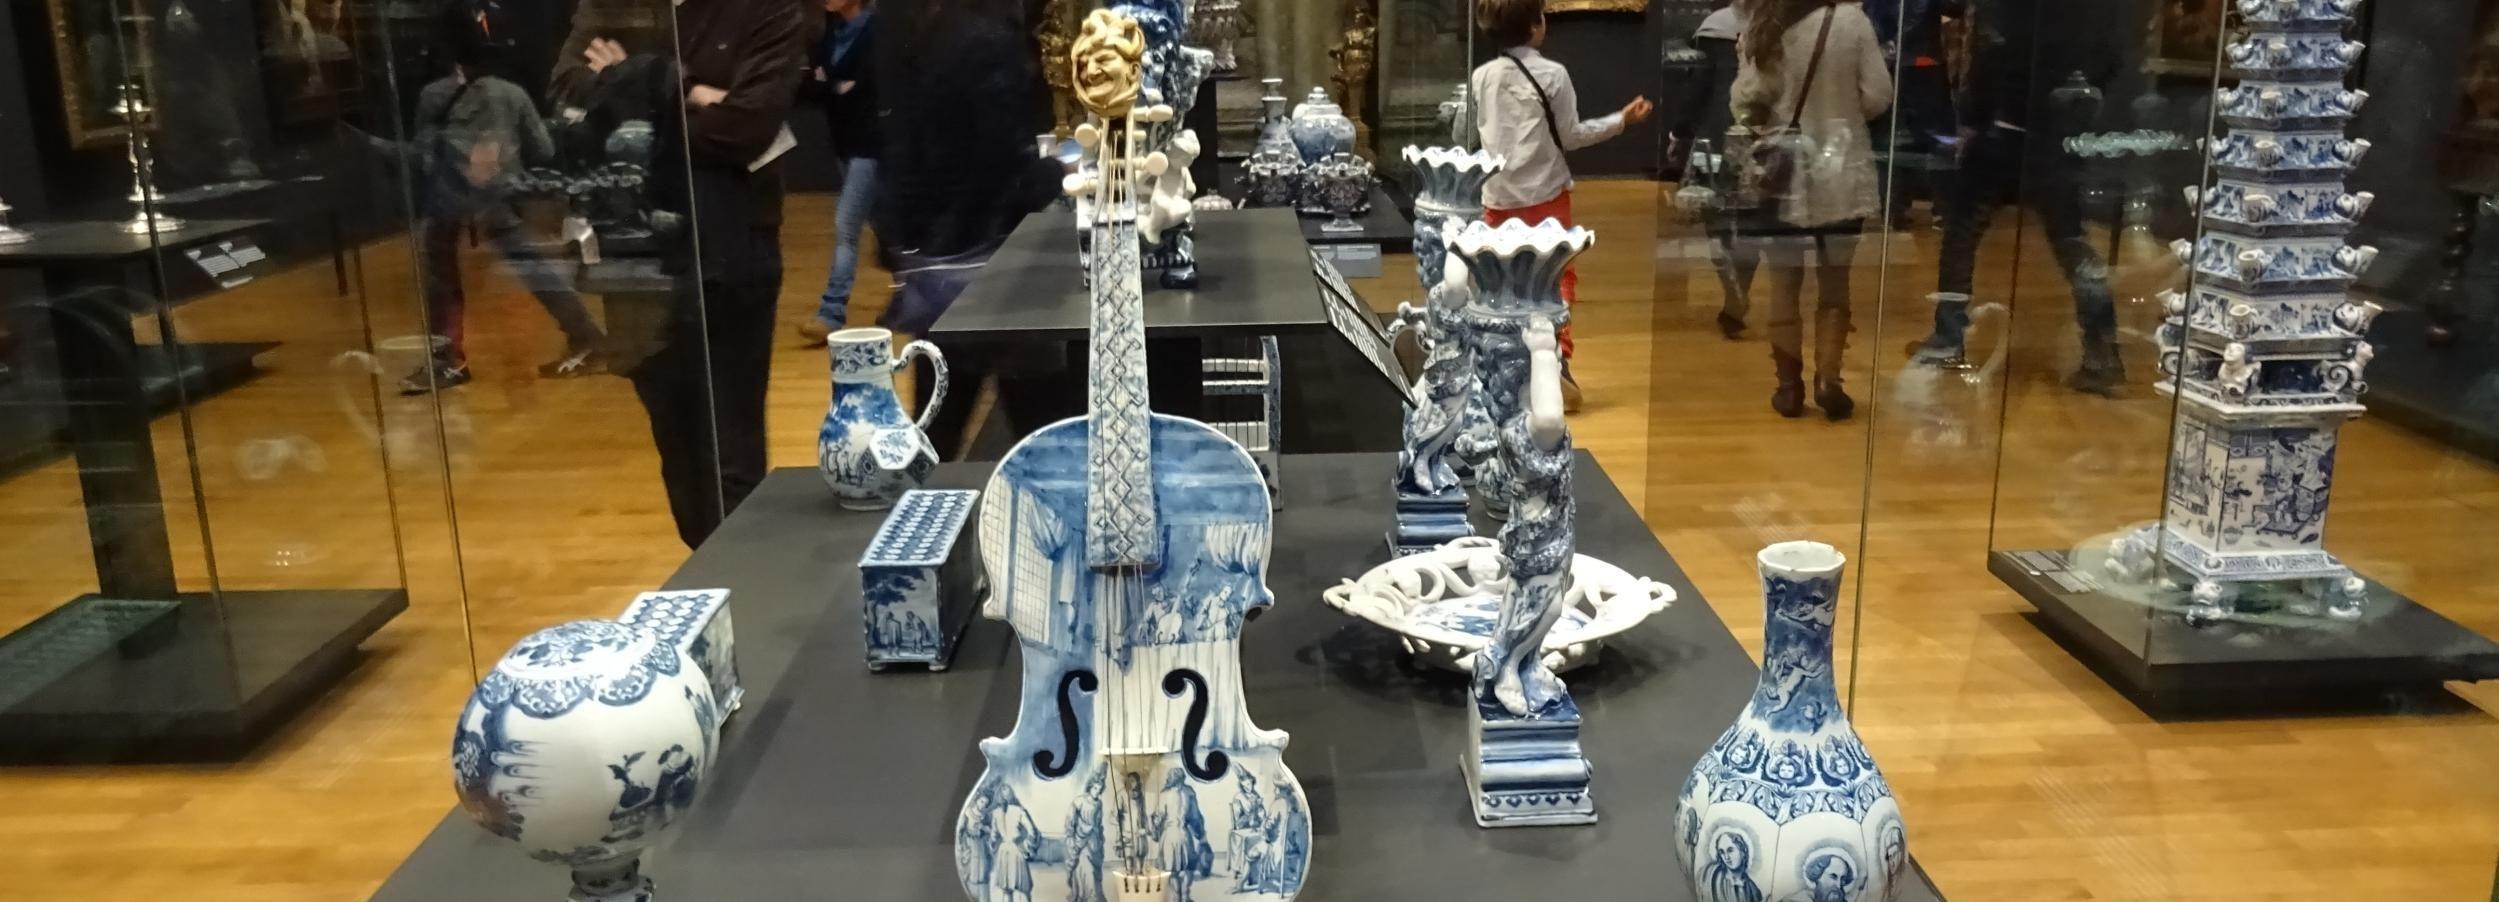 3-Hour Tour: Highlights of 17th Century Dutch Art & History